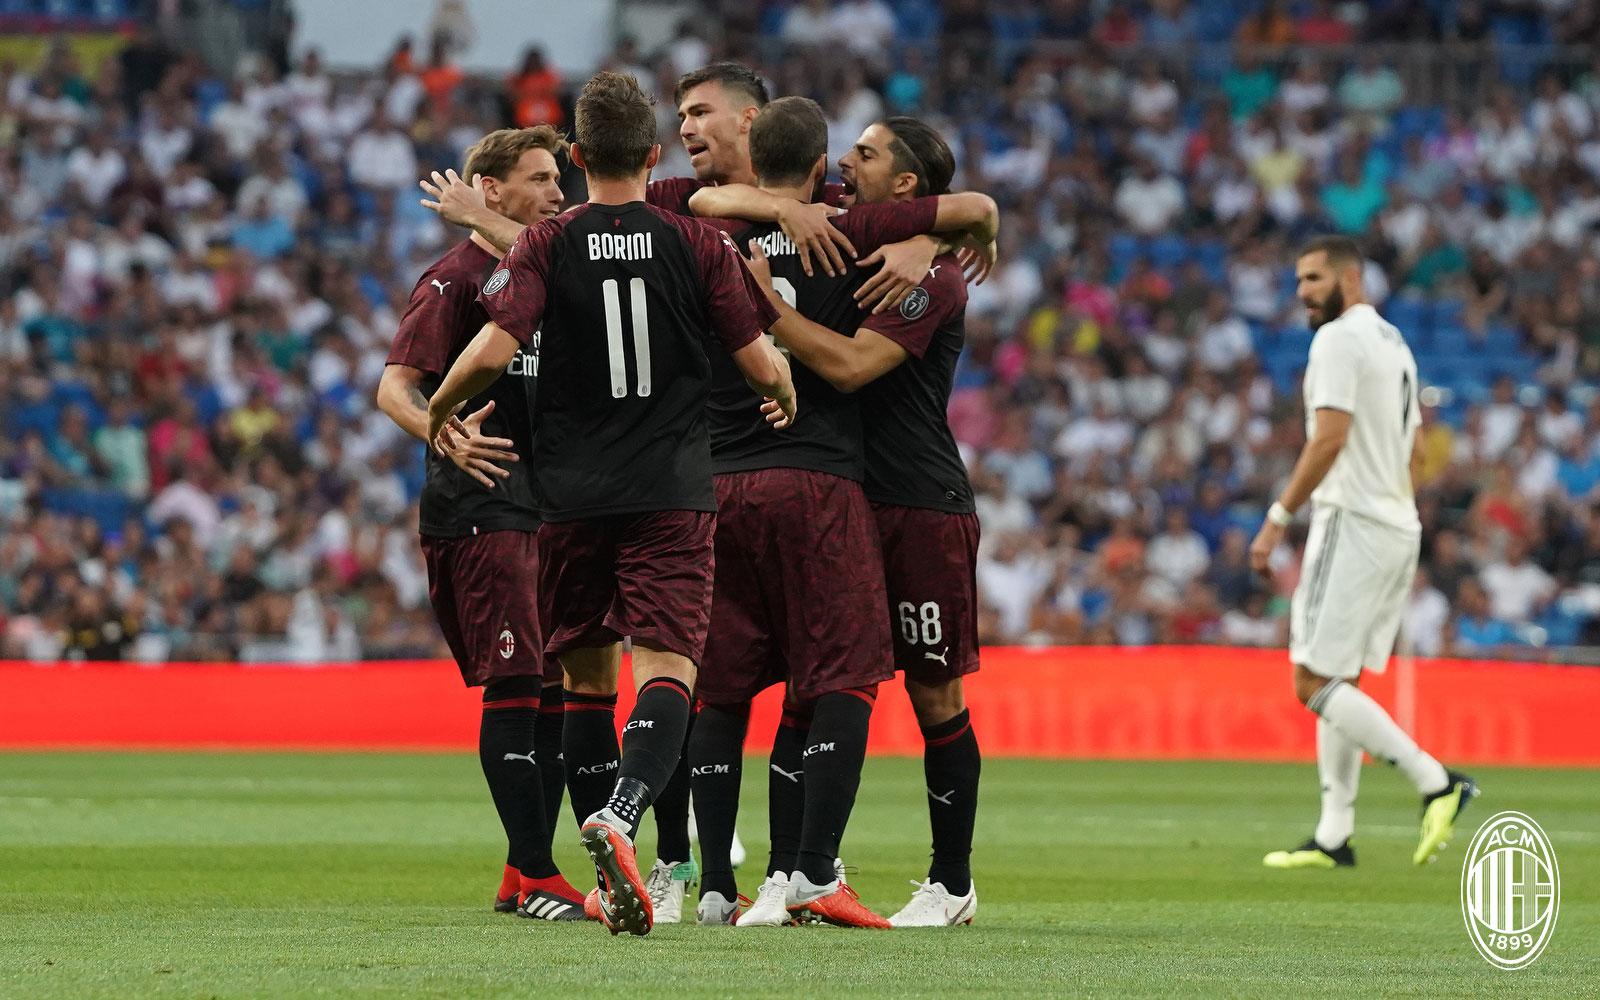 Gonzalo Higuain celebrating with Lucas Biglia, Alessio Romagnoli, Ricardo Rodriguez and Fabio Borini during Real Madrid-Milan at Estadio Santiago Bernabéu on August 11, 2018. (@acmilan.com)